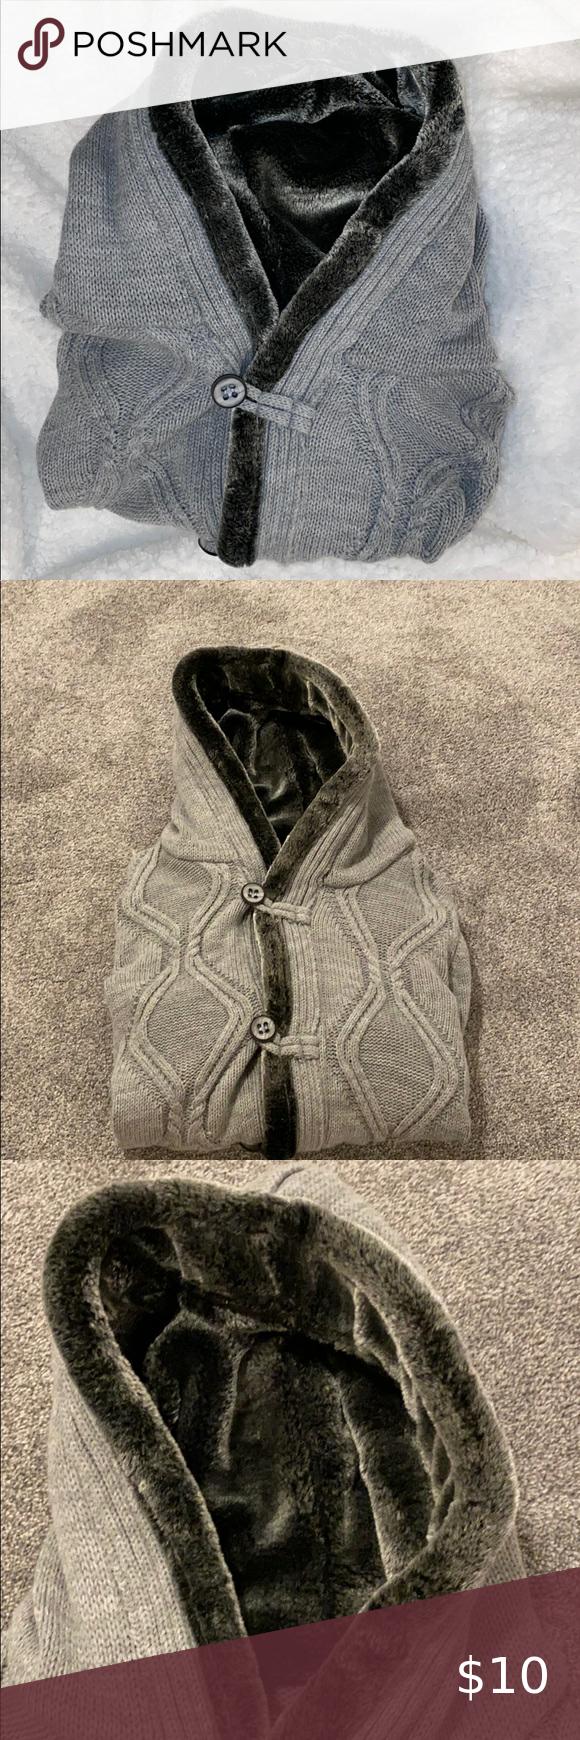 Men Button Down Sweater Size Medium